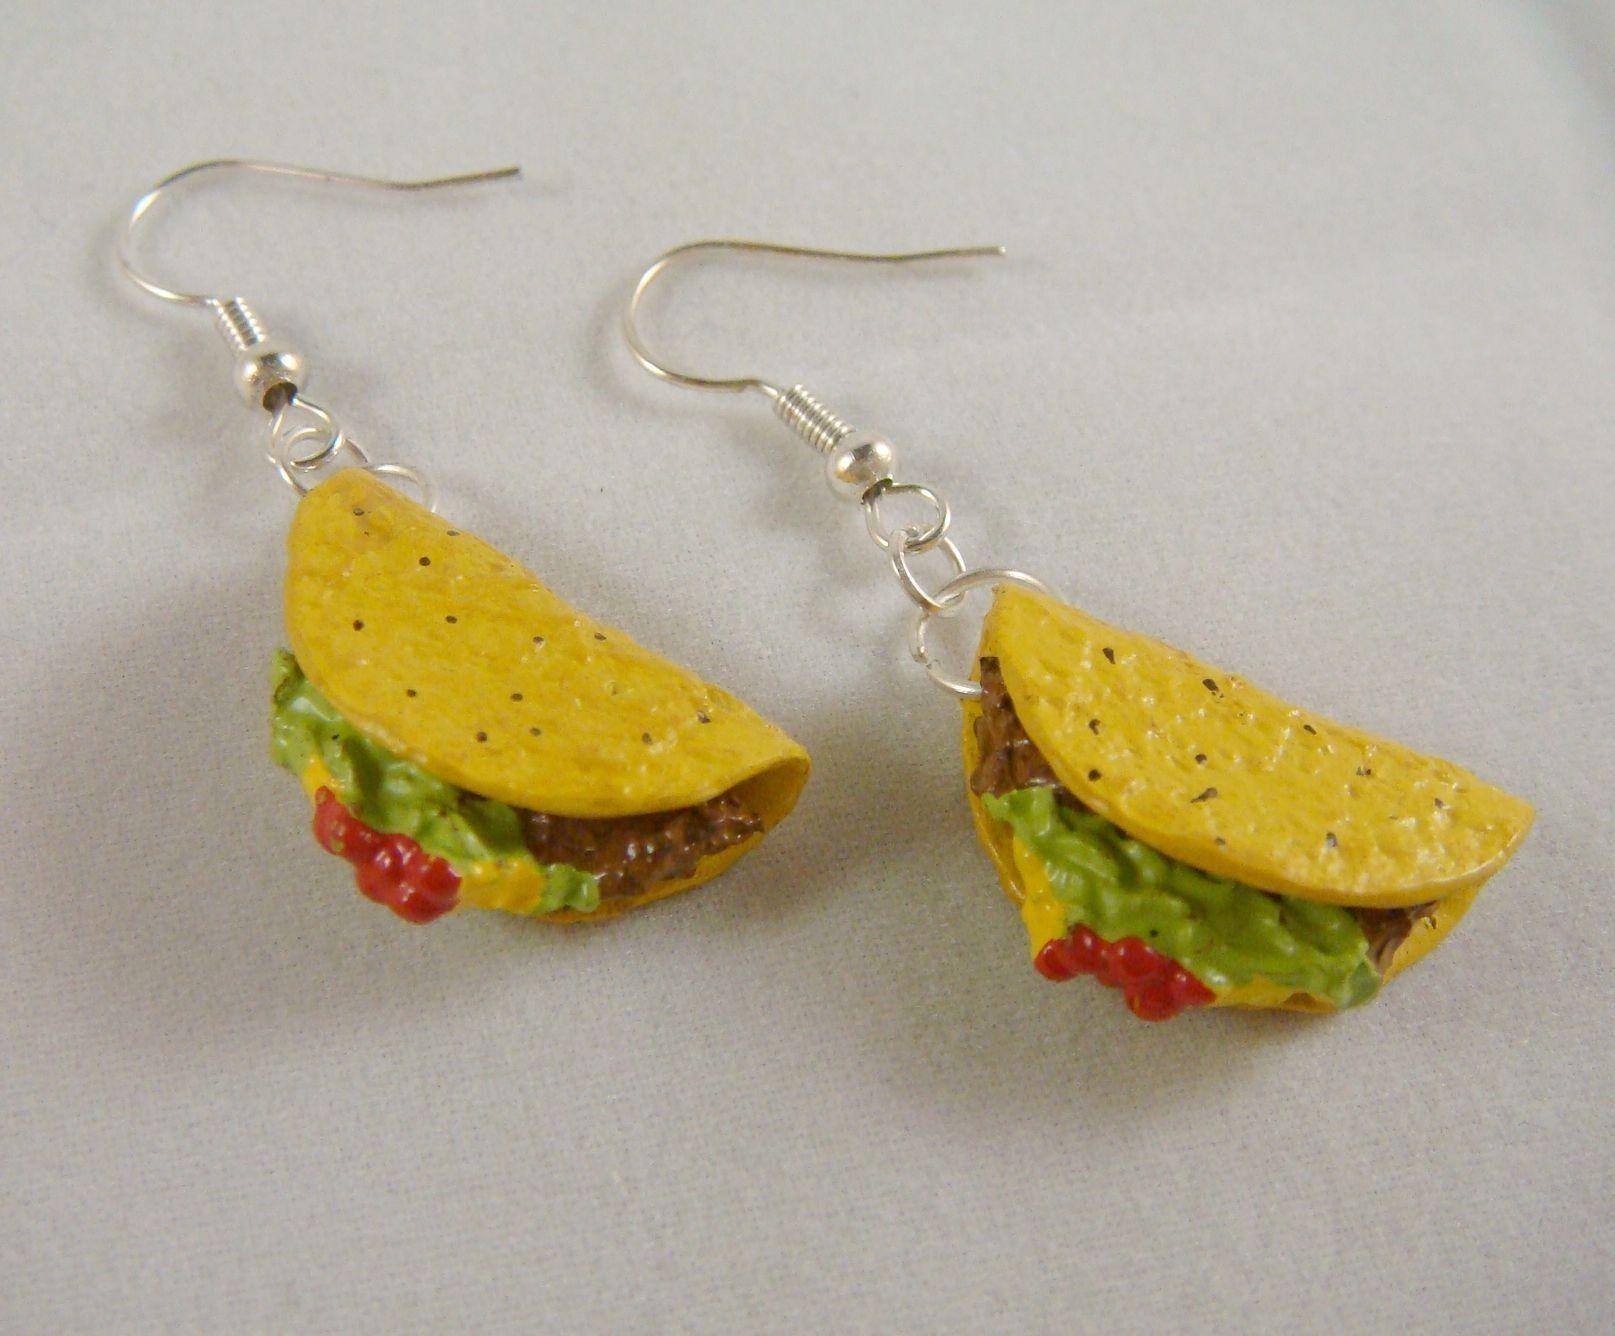 Miniature Food Jewelry - Taco Earrings